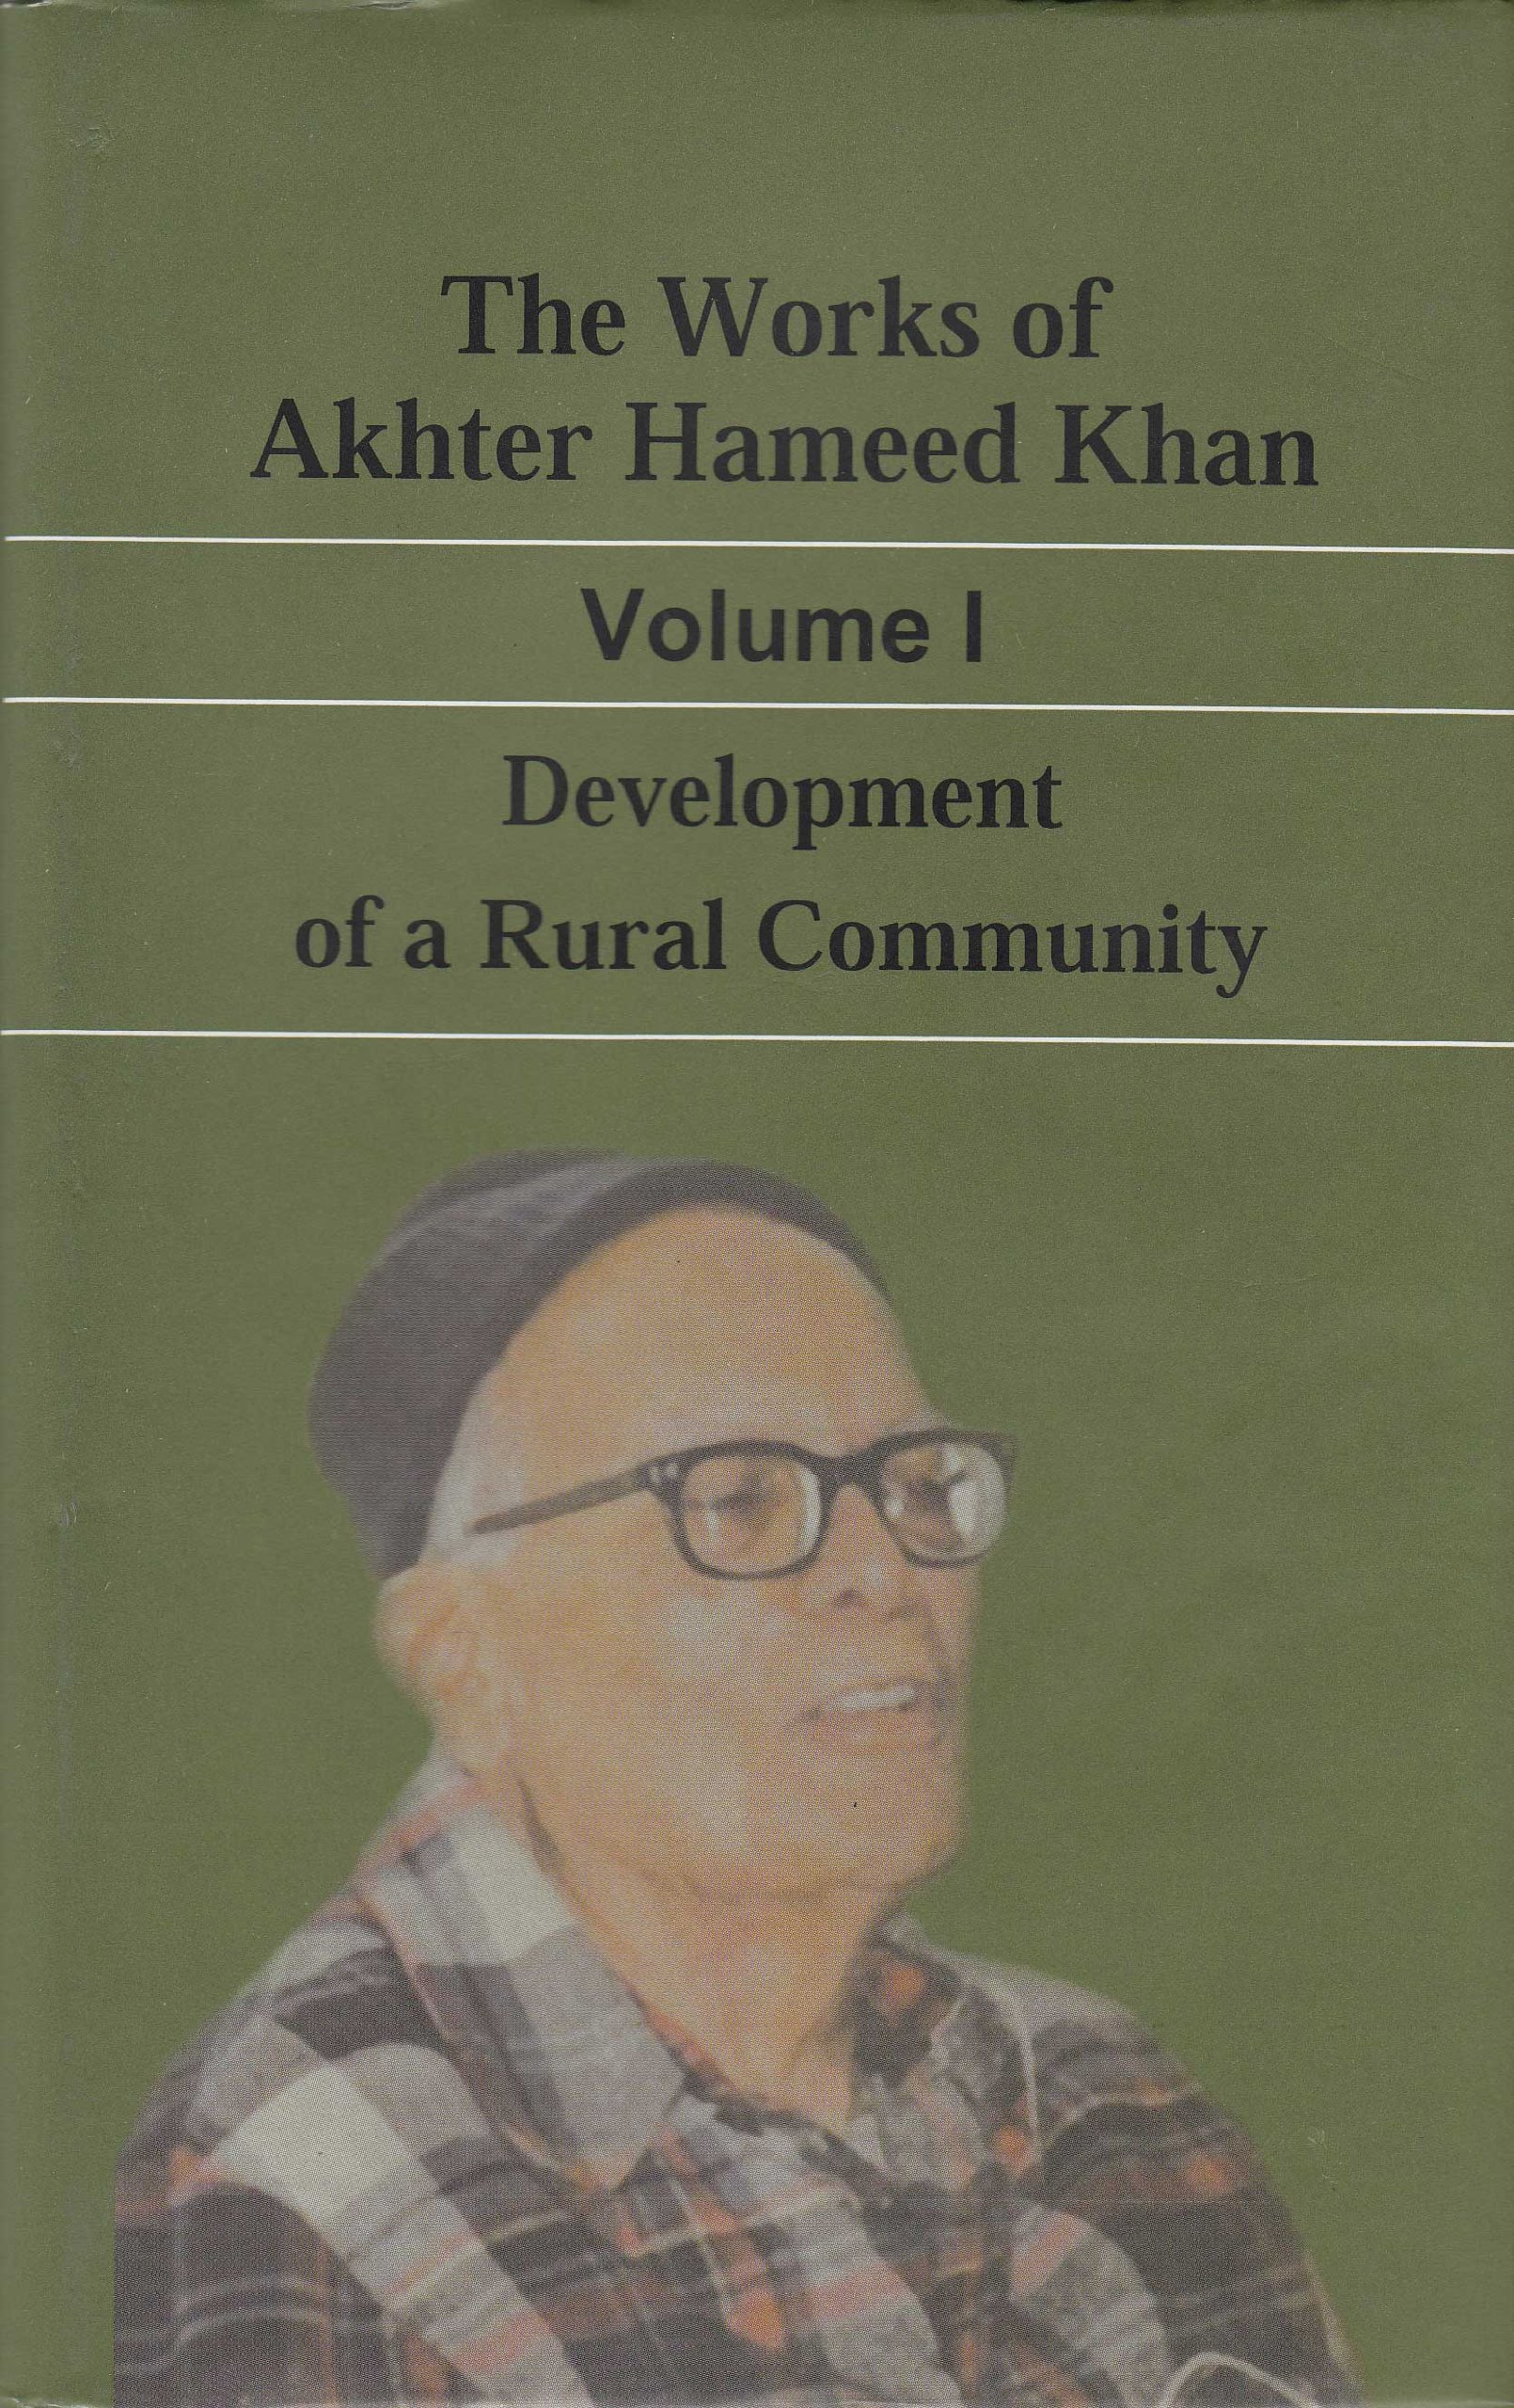 The Works of Akhter Hameed Khan, Volume 1: Development of a Rural Community ebook